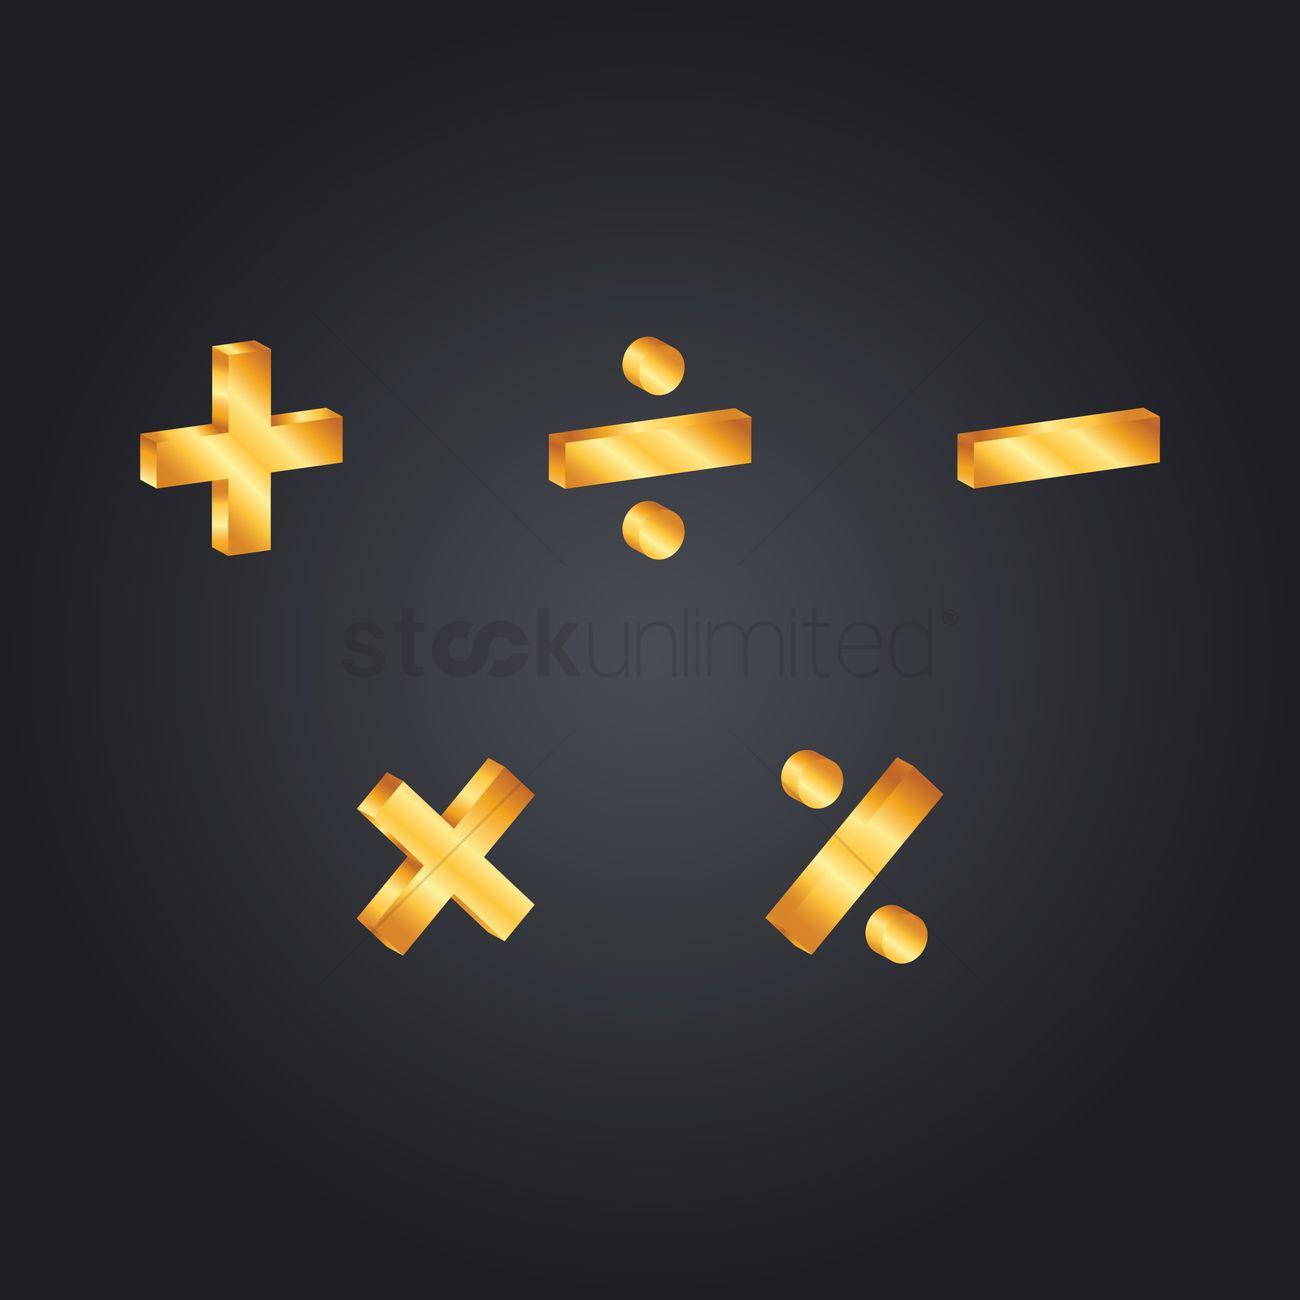 Set Of Mathematical Symbols Vector Image 1634543 Stockunlimited